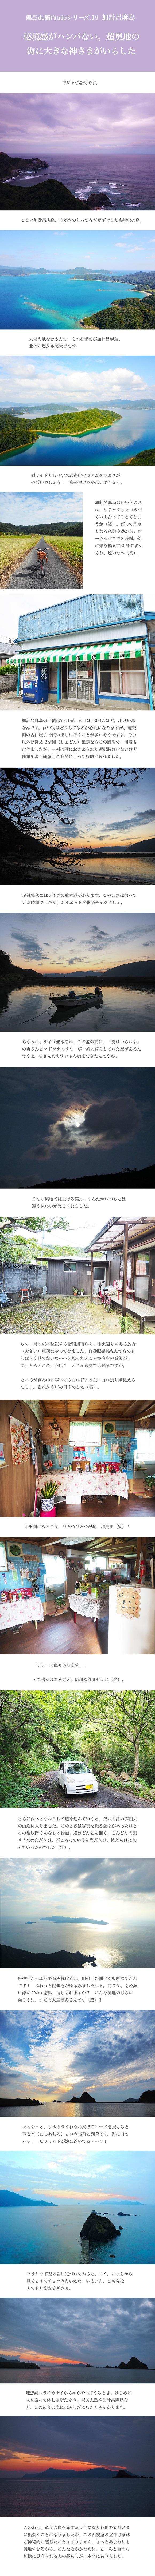 tomako201112.jpg